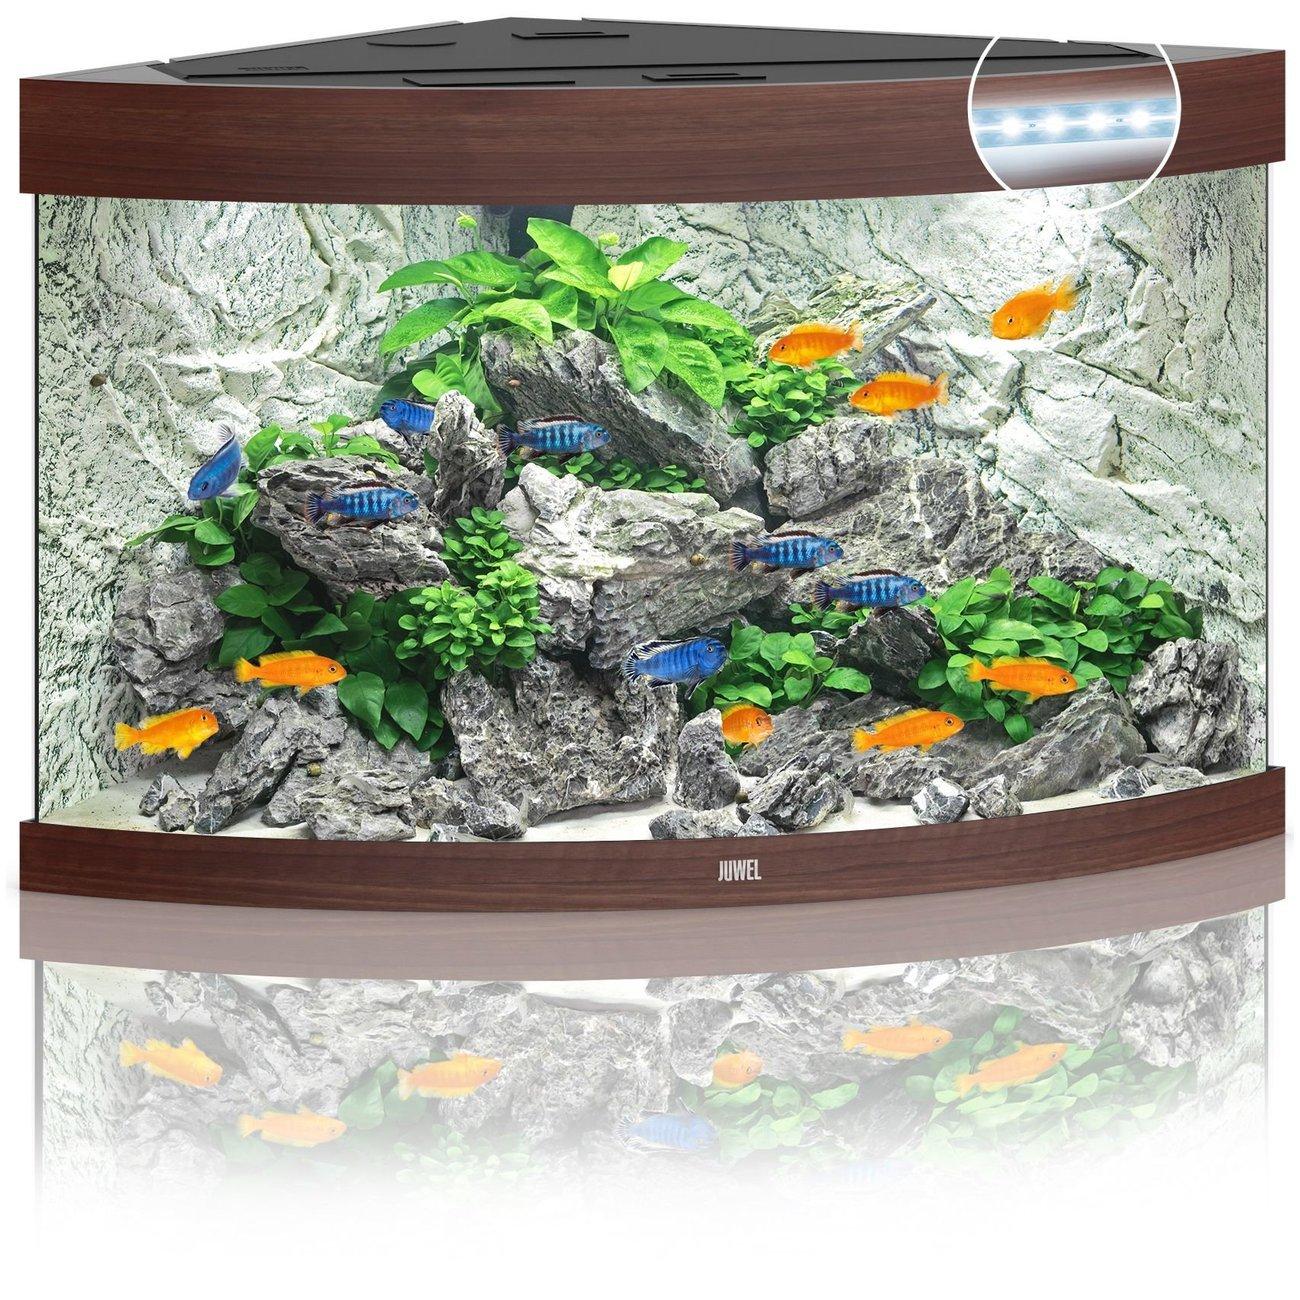 JUWEL Trigon 190 LED Aquarium, 190 Liter, dunkelbraun